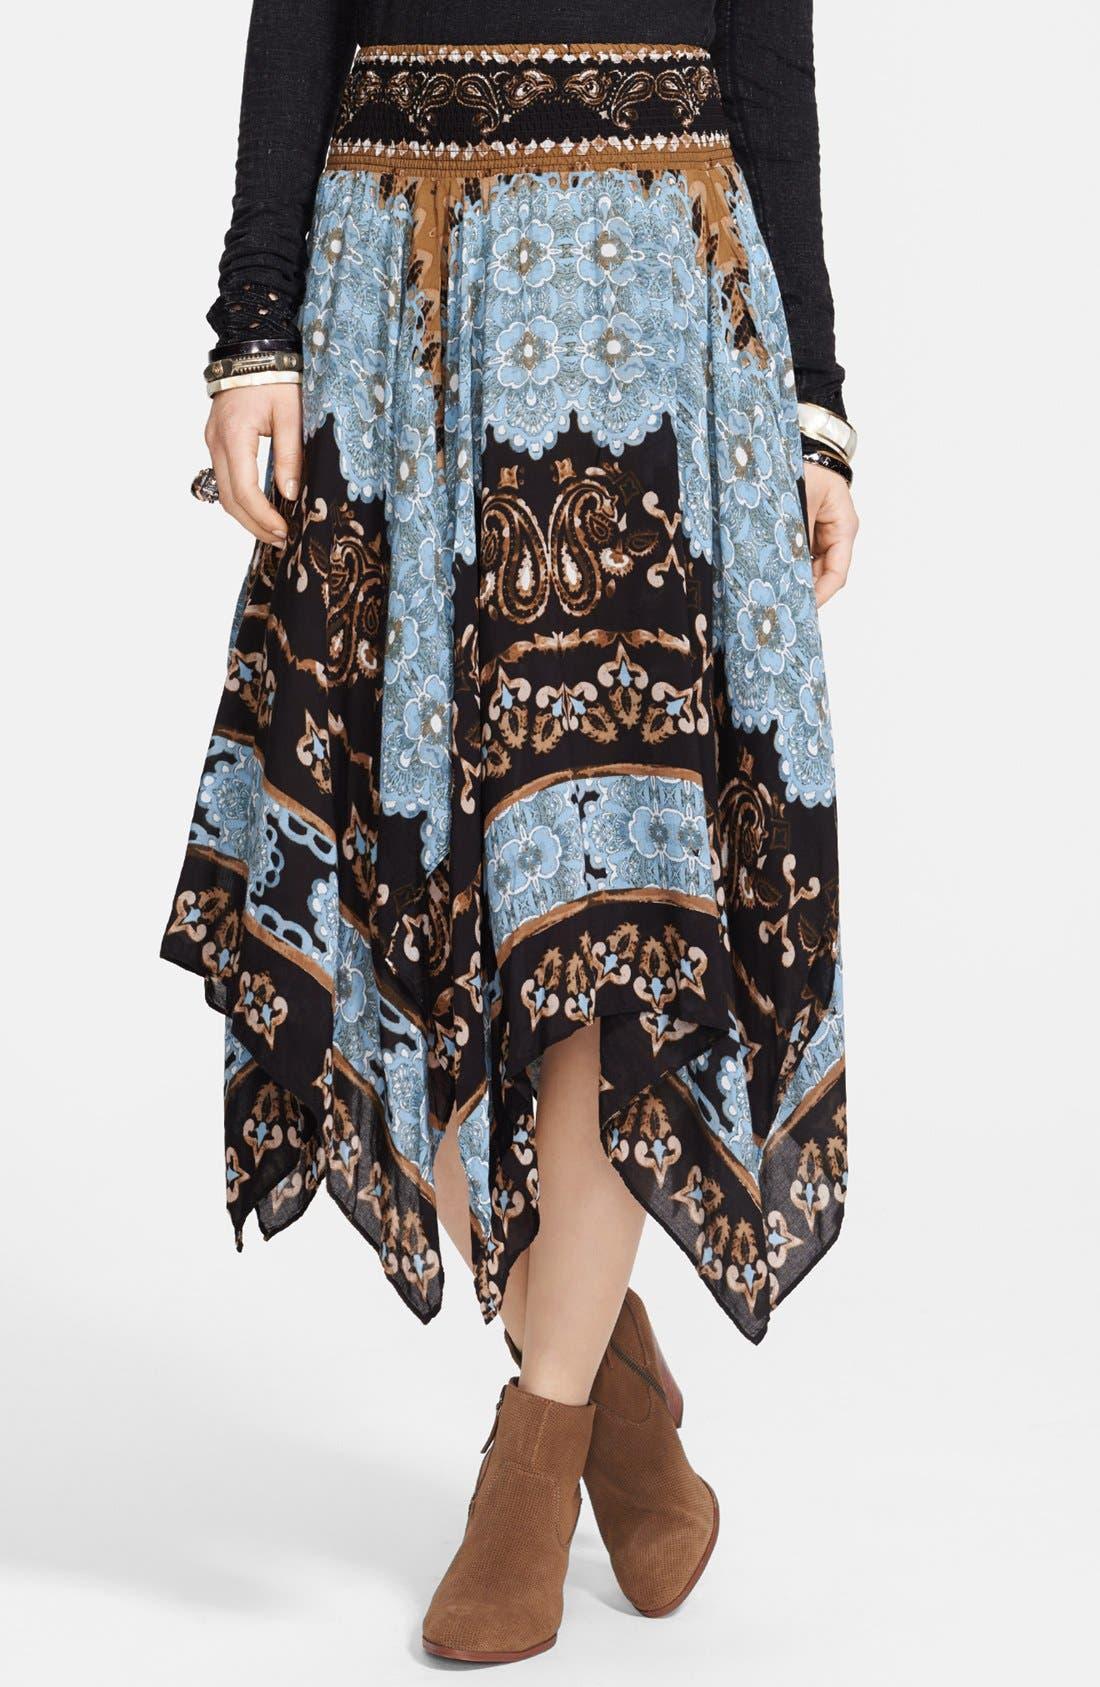 Main Image - Free People 'Fly Away' Print Handkerchief Skirt